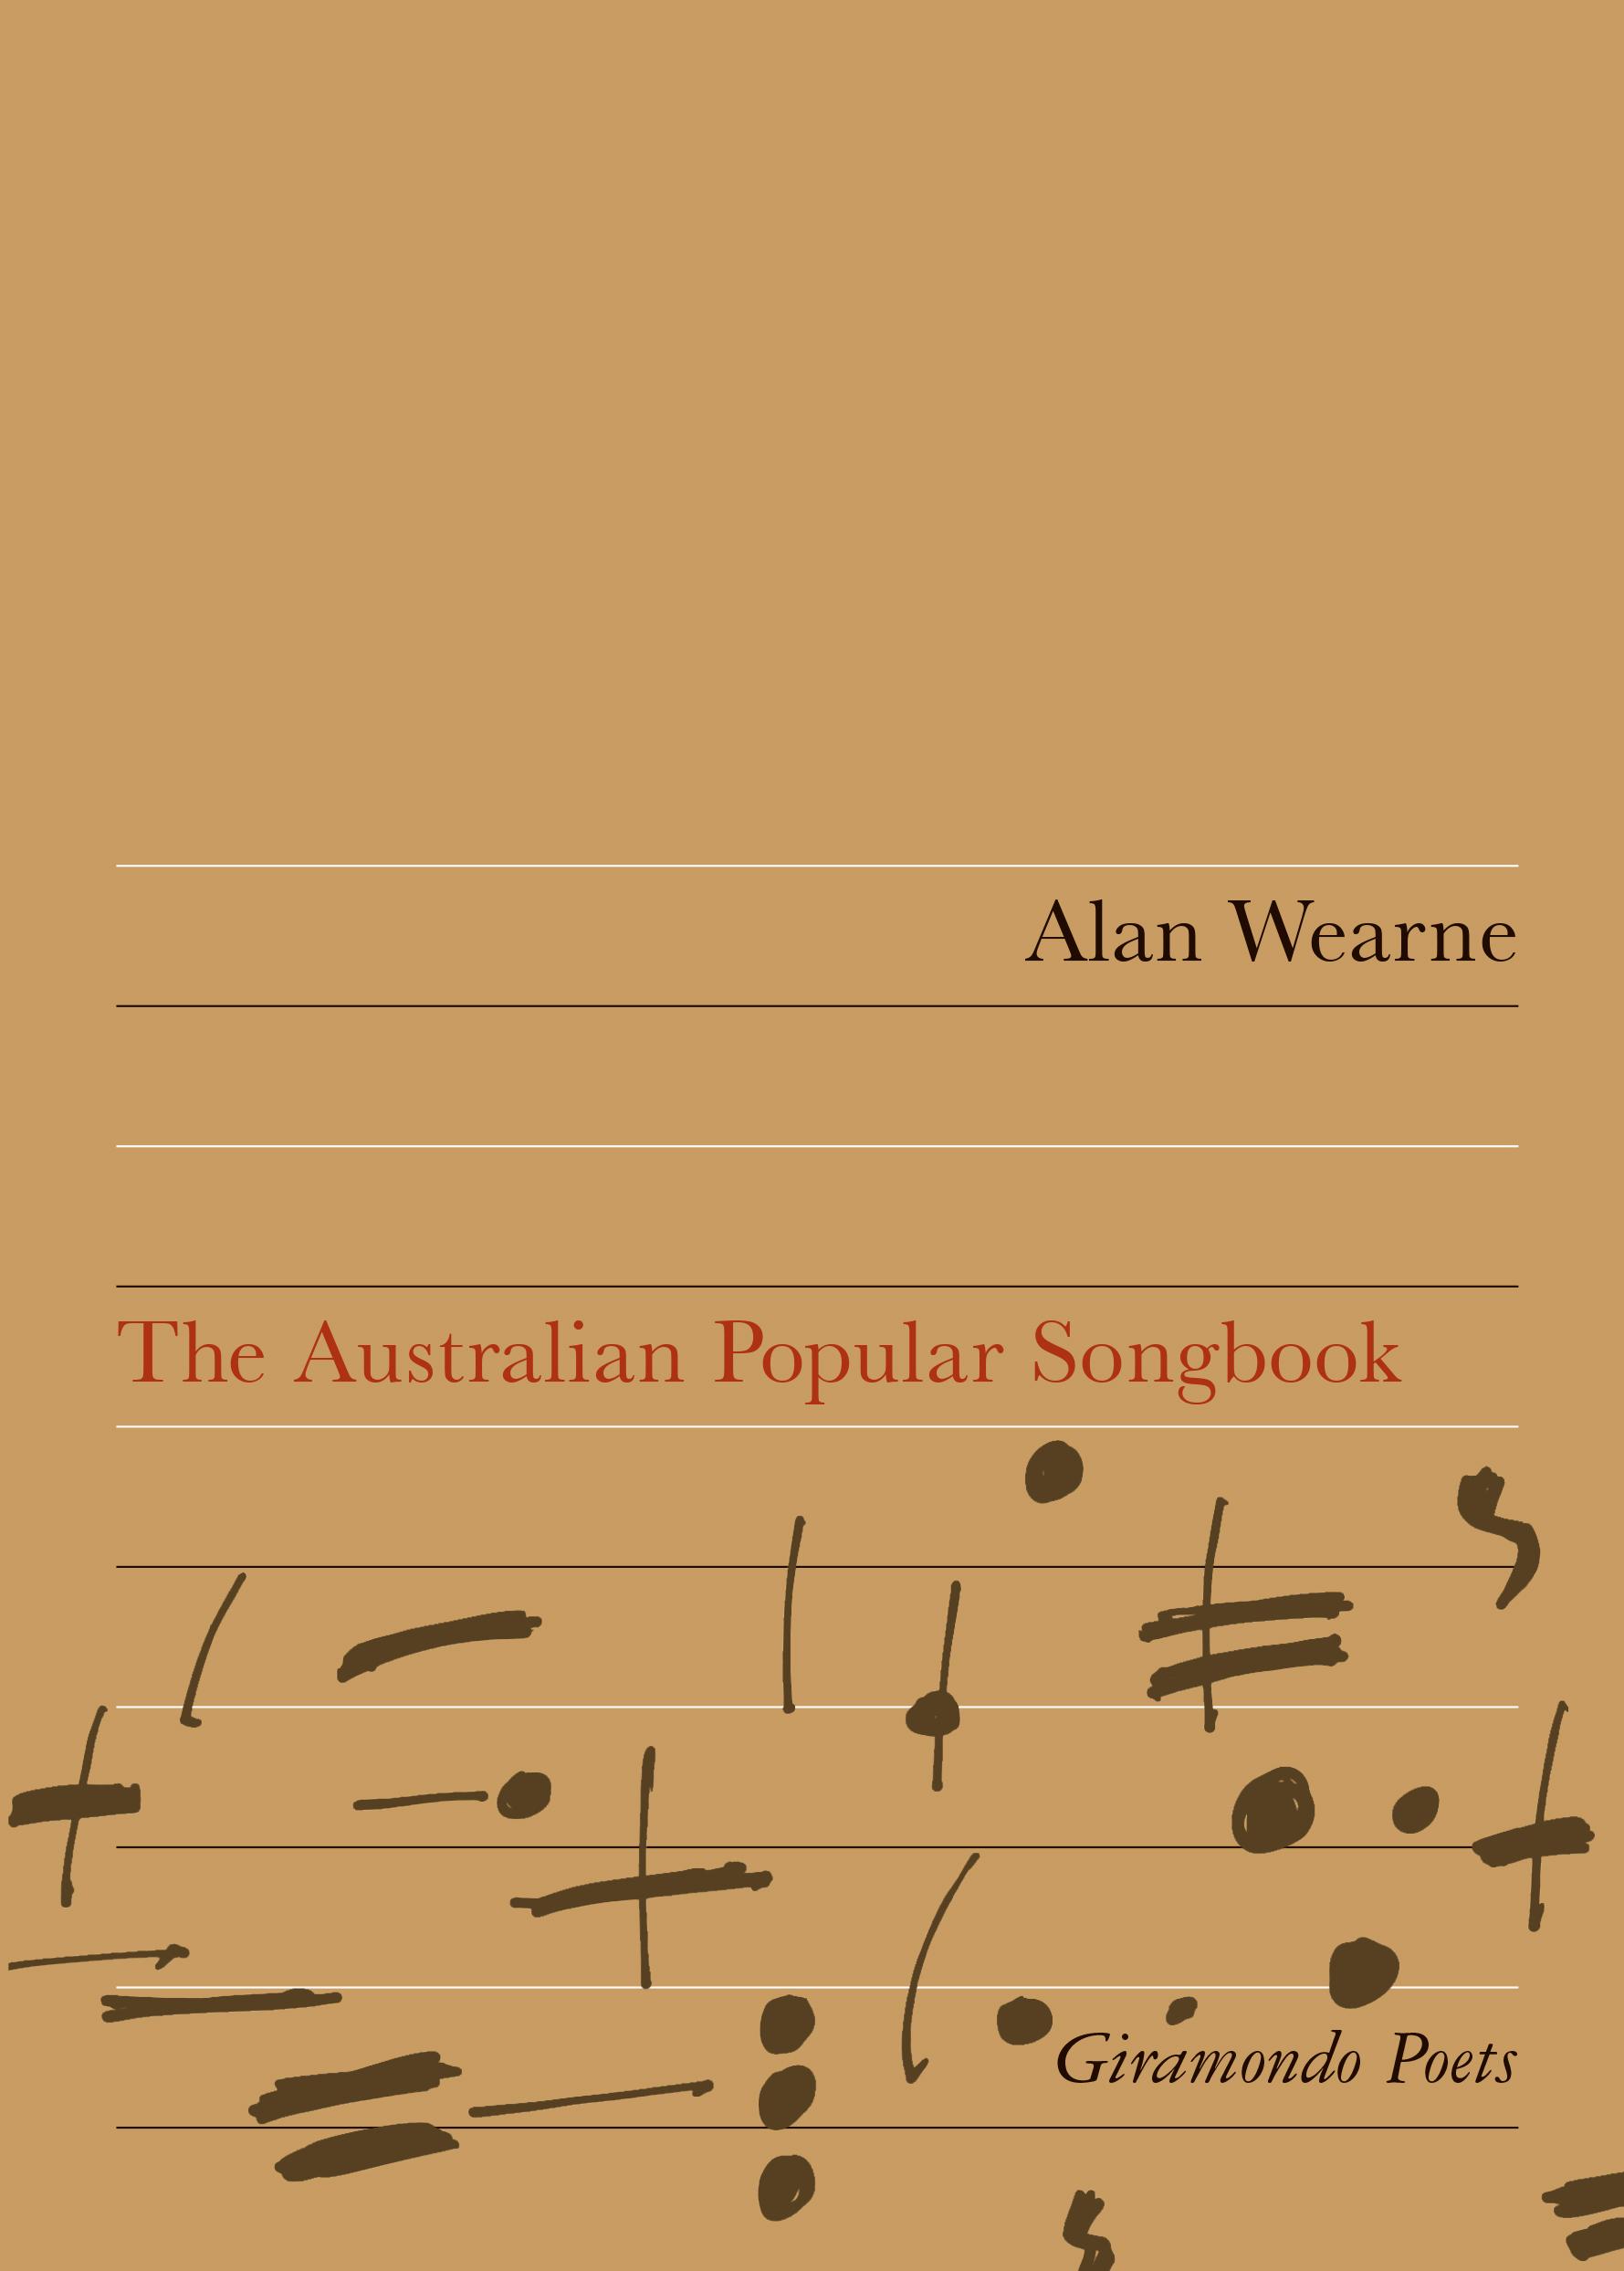 The Australian Popular Songbook